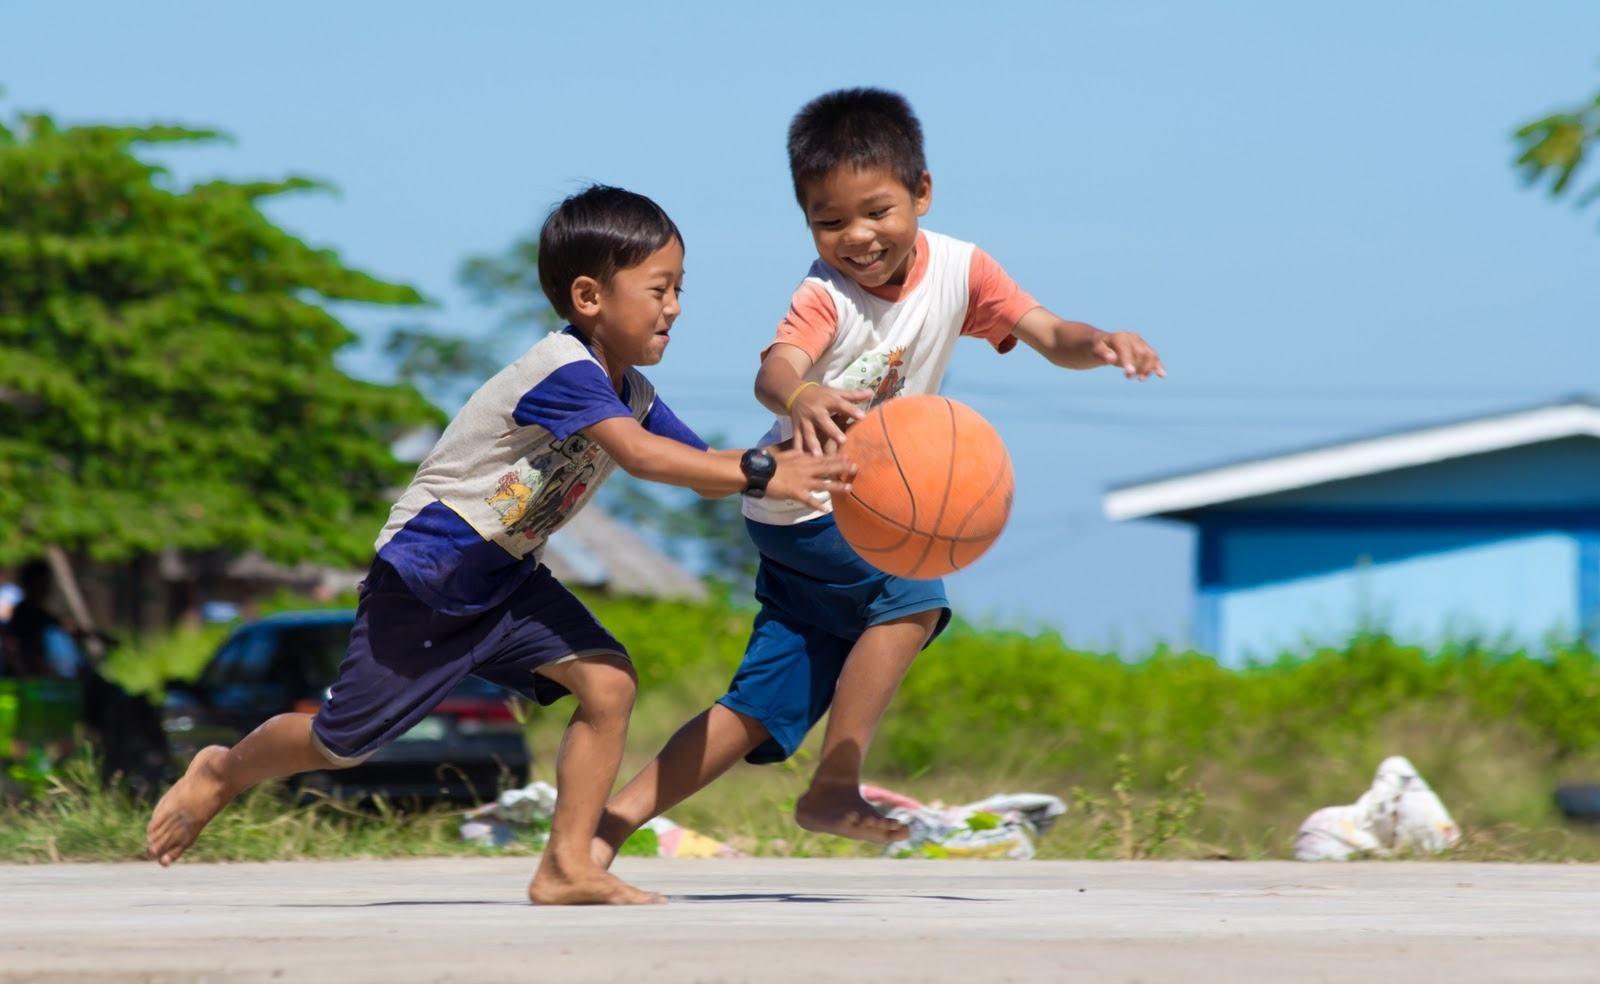 Happy Kids Playing Basketball Kids Playing Sports Kids Sports Kids Playing